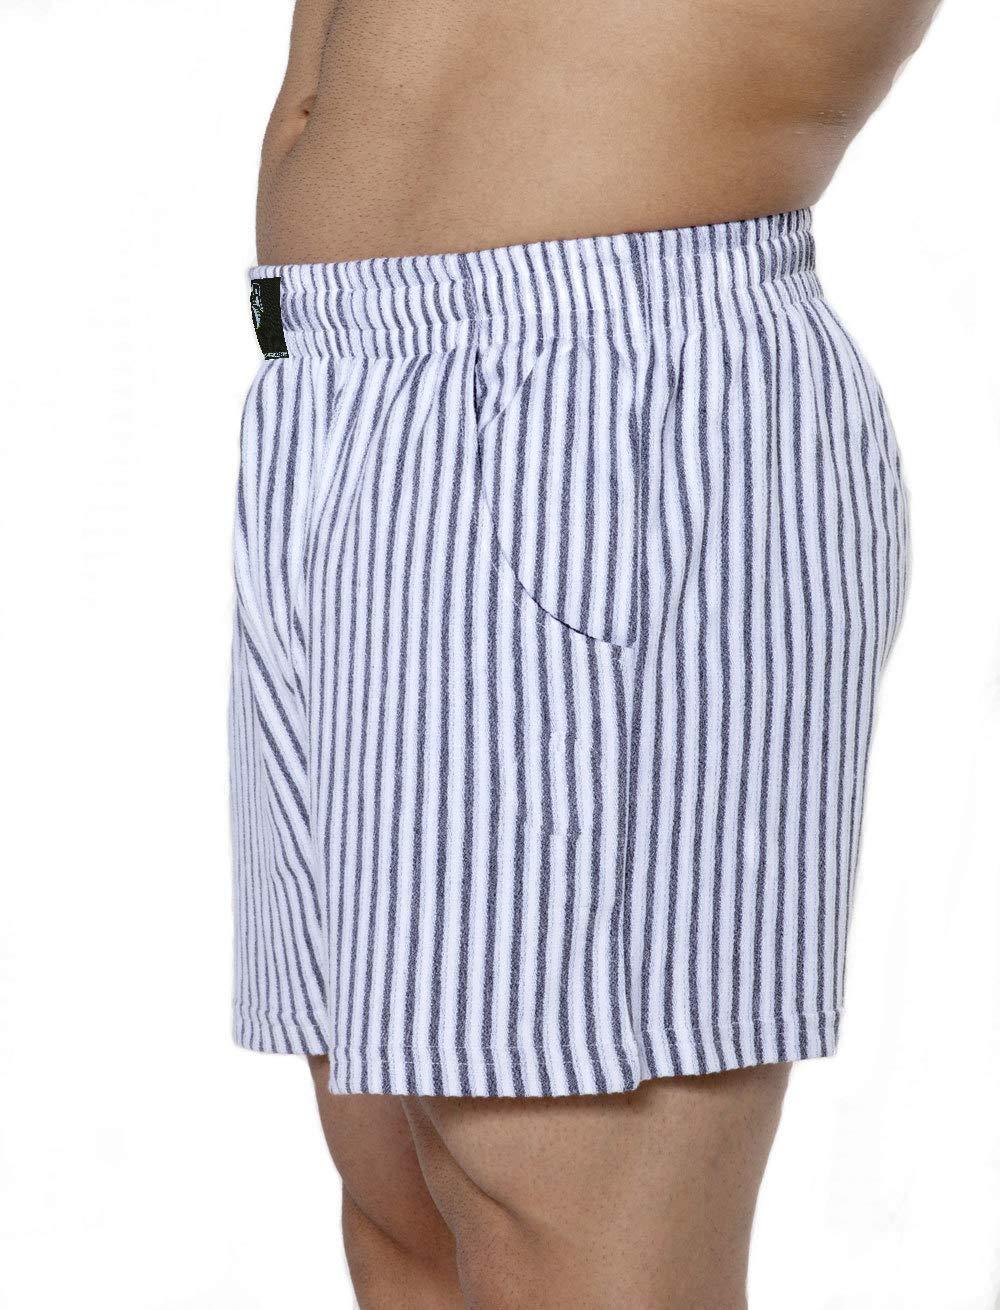 STILYA Sportswear Herren Bermuda Shorts Bodybuilding 1351-ST